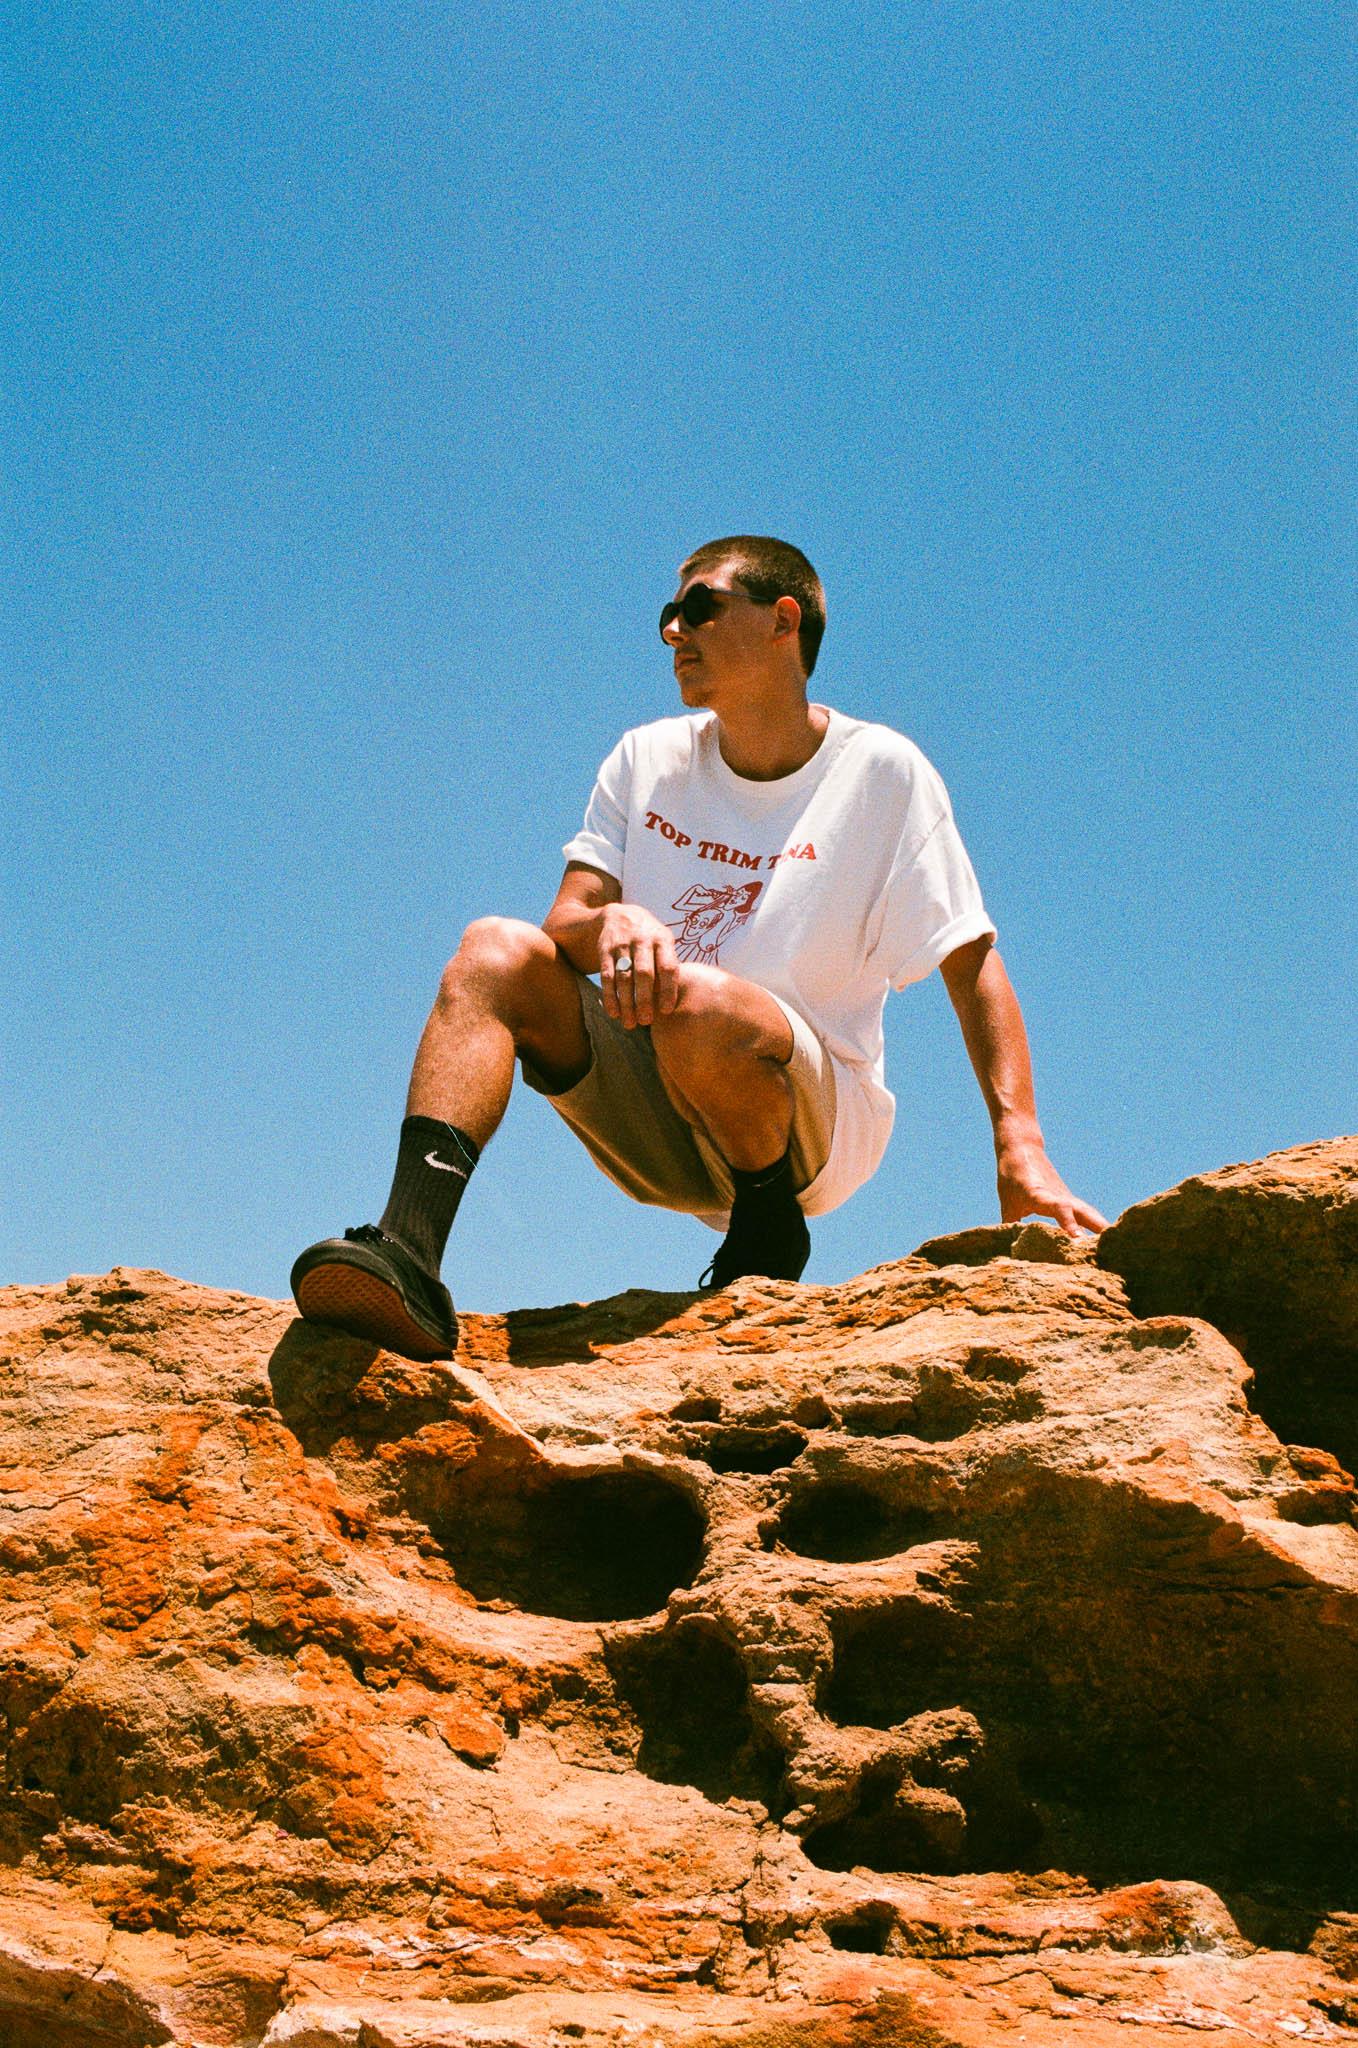 Mark on the Rocks